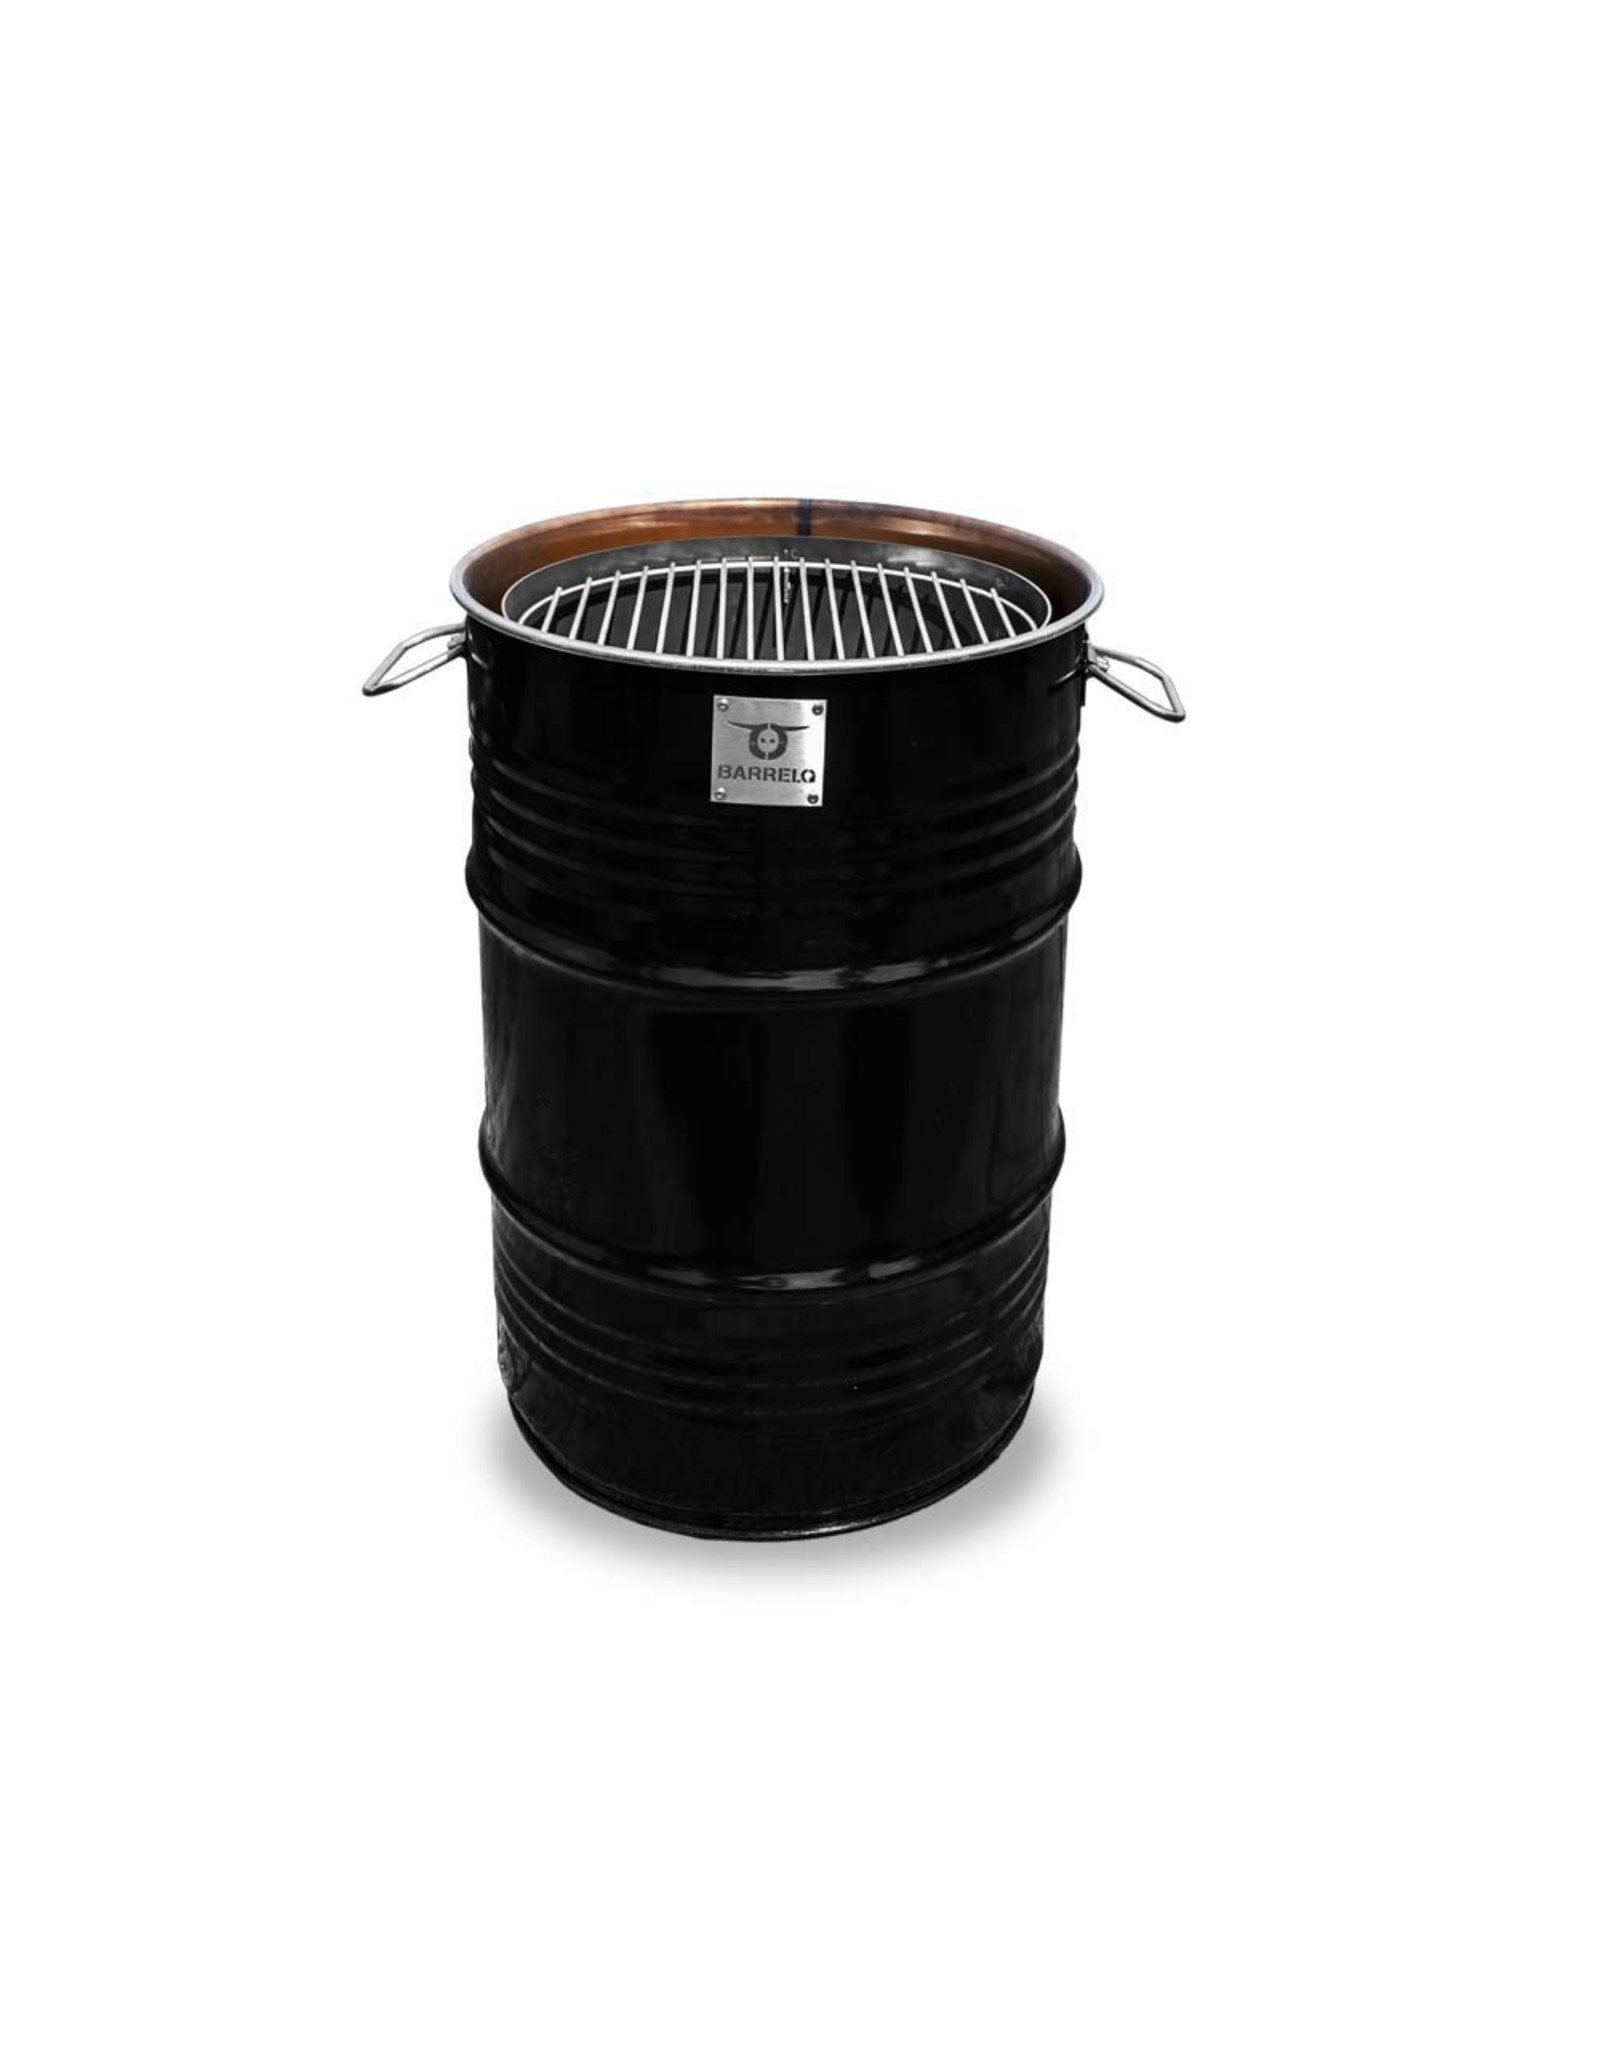 BarrelQ BarrelQ Small Notorius zwart 60 Liter Barbecue, vuurkorf en statafel in n